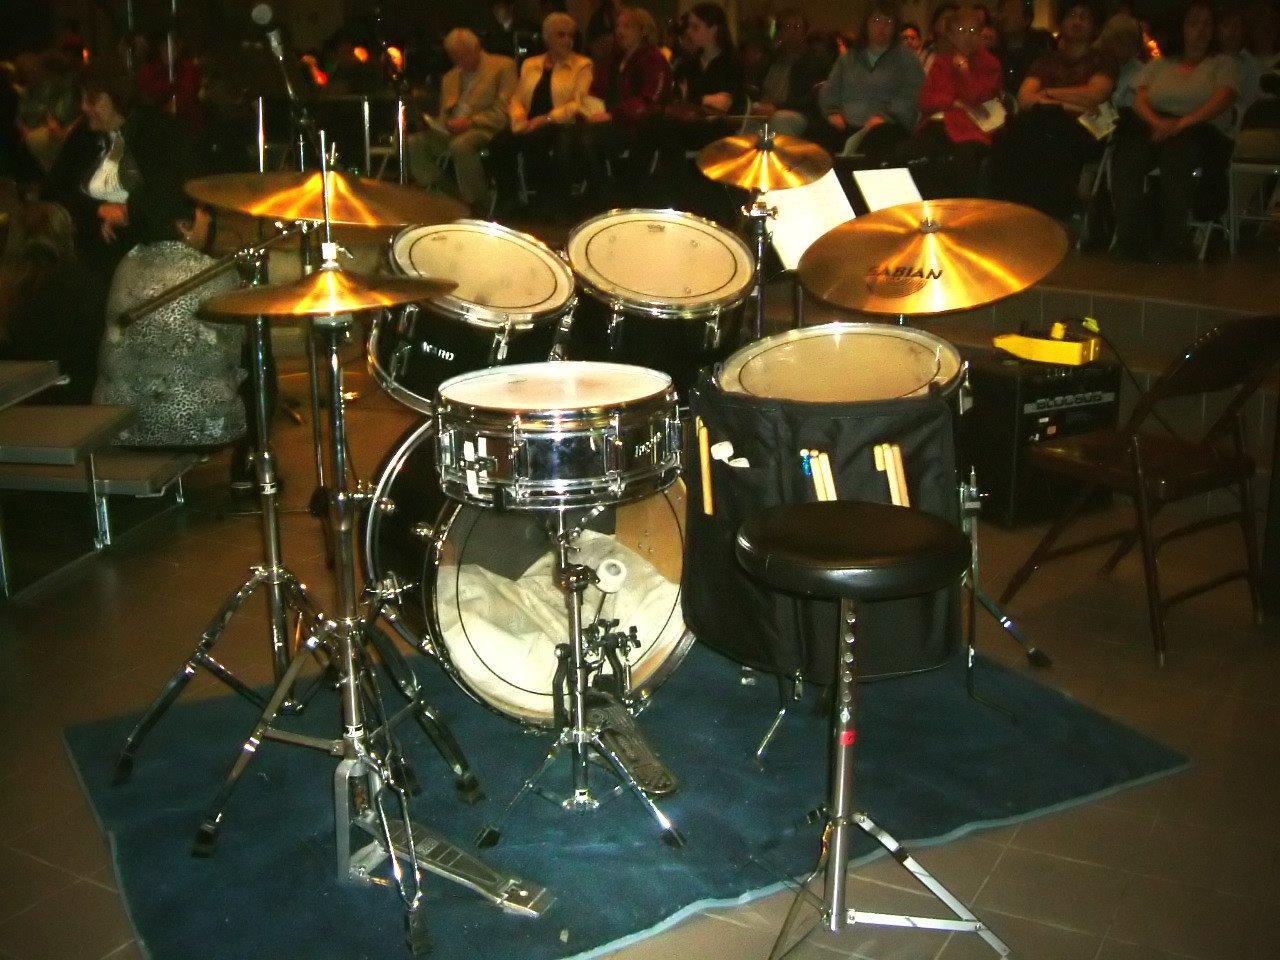 Free Drum Kit Stock Photo - FreeImages com